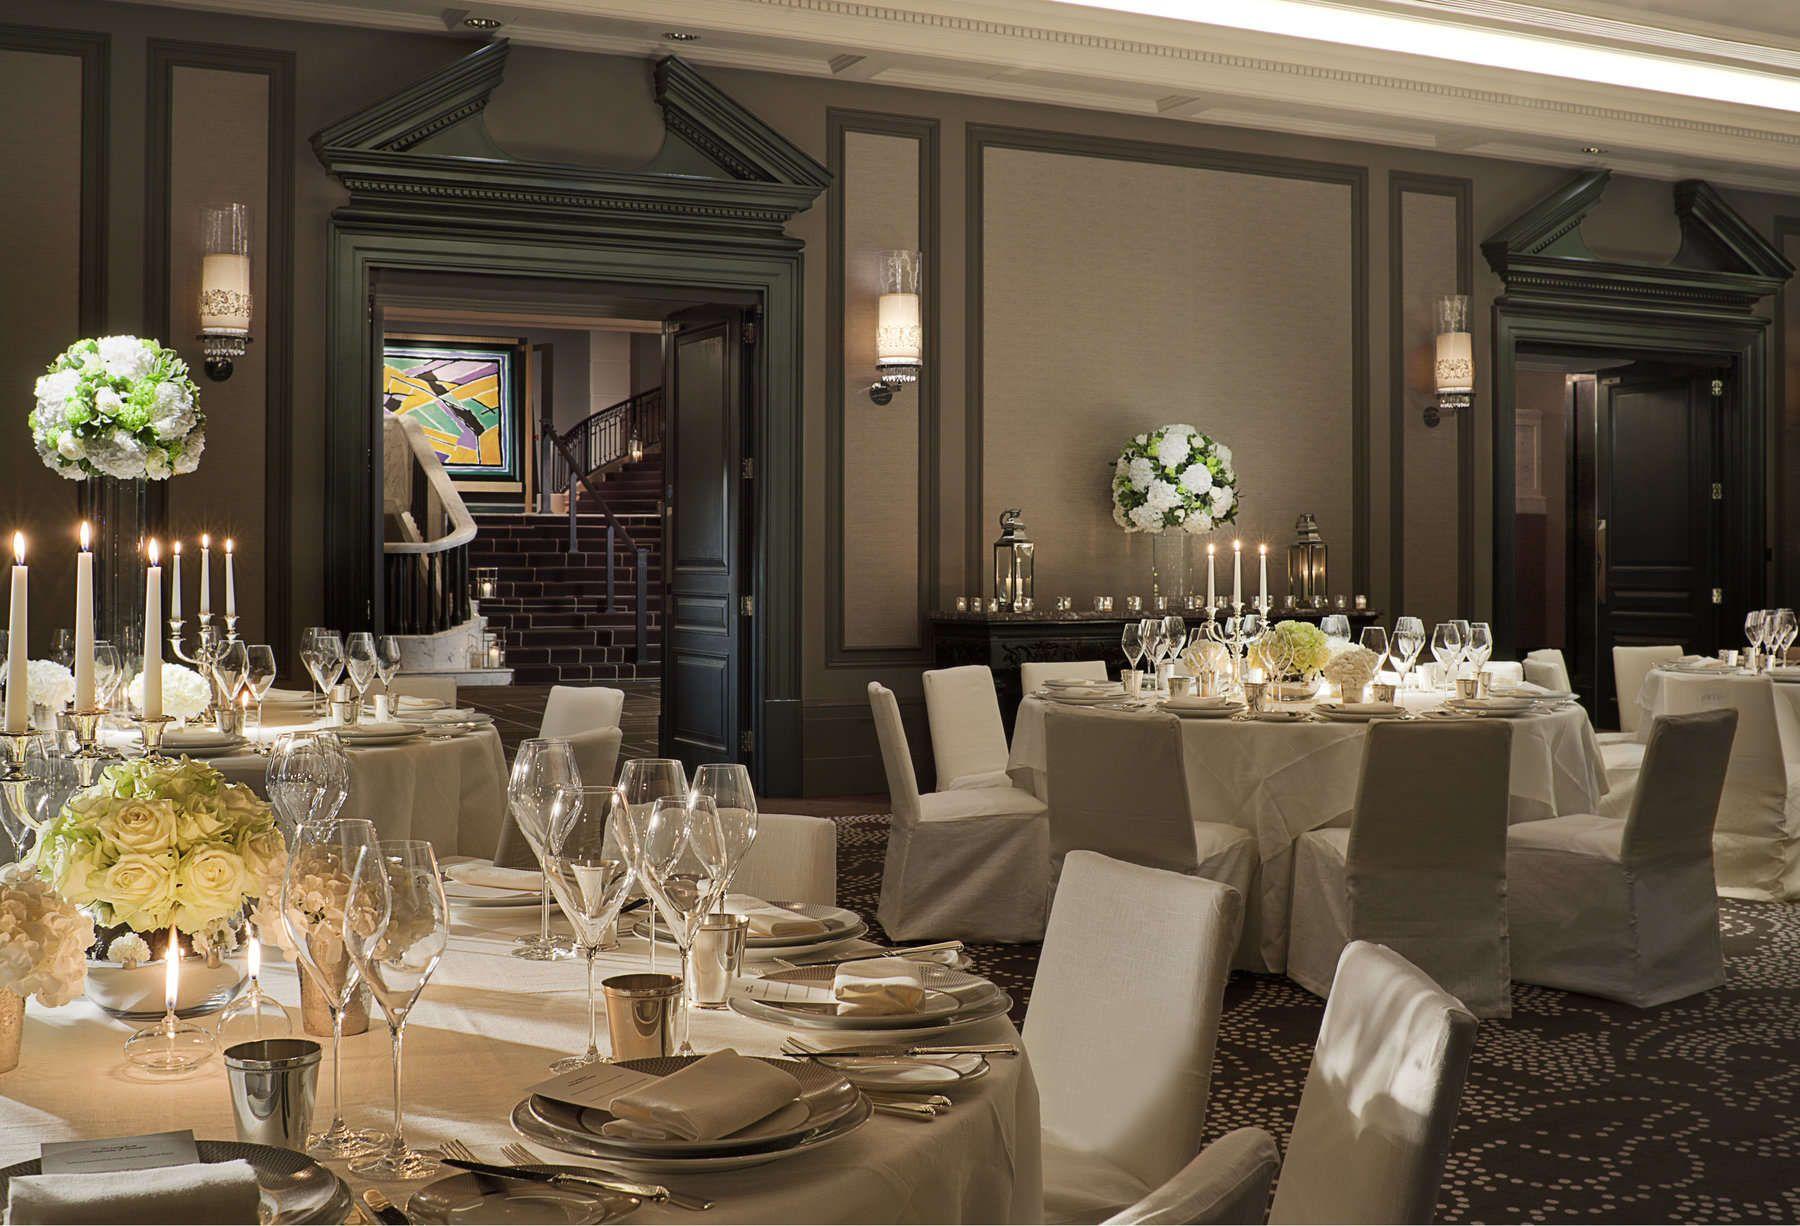 Rosewood London Grand Ballroom Hotels & Pre